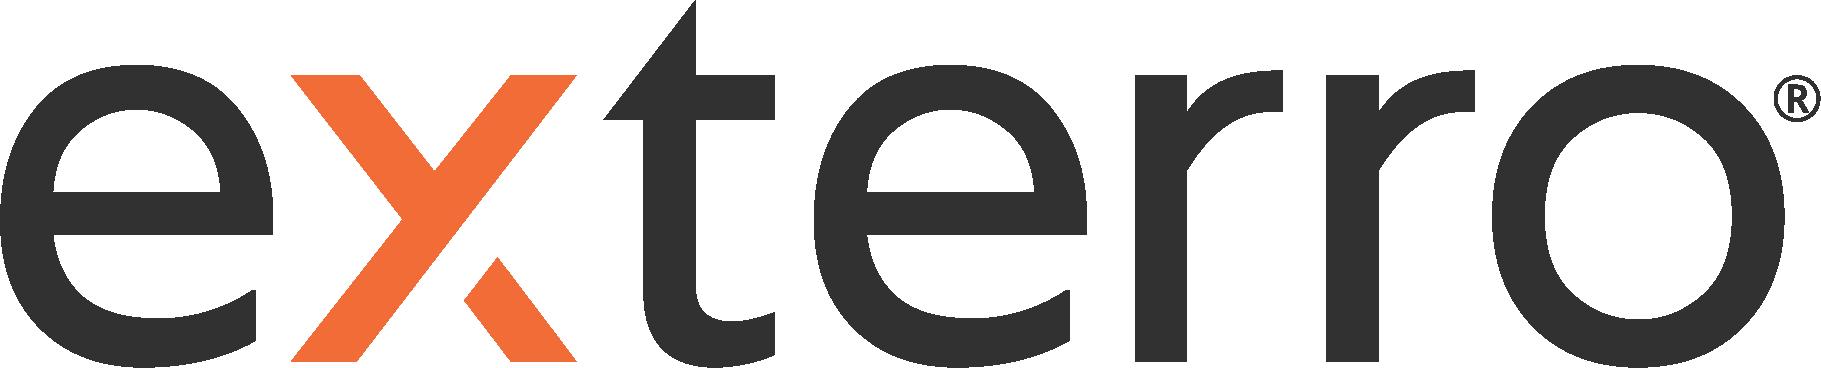 exterro-logo-rgb.png